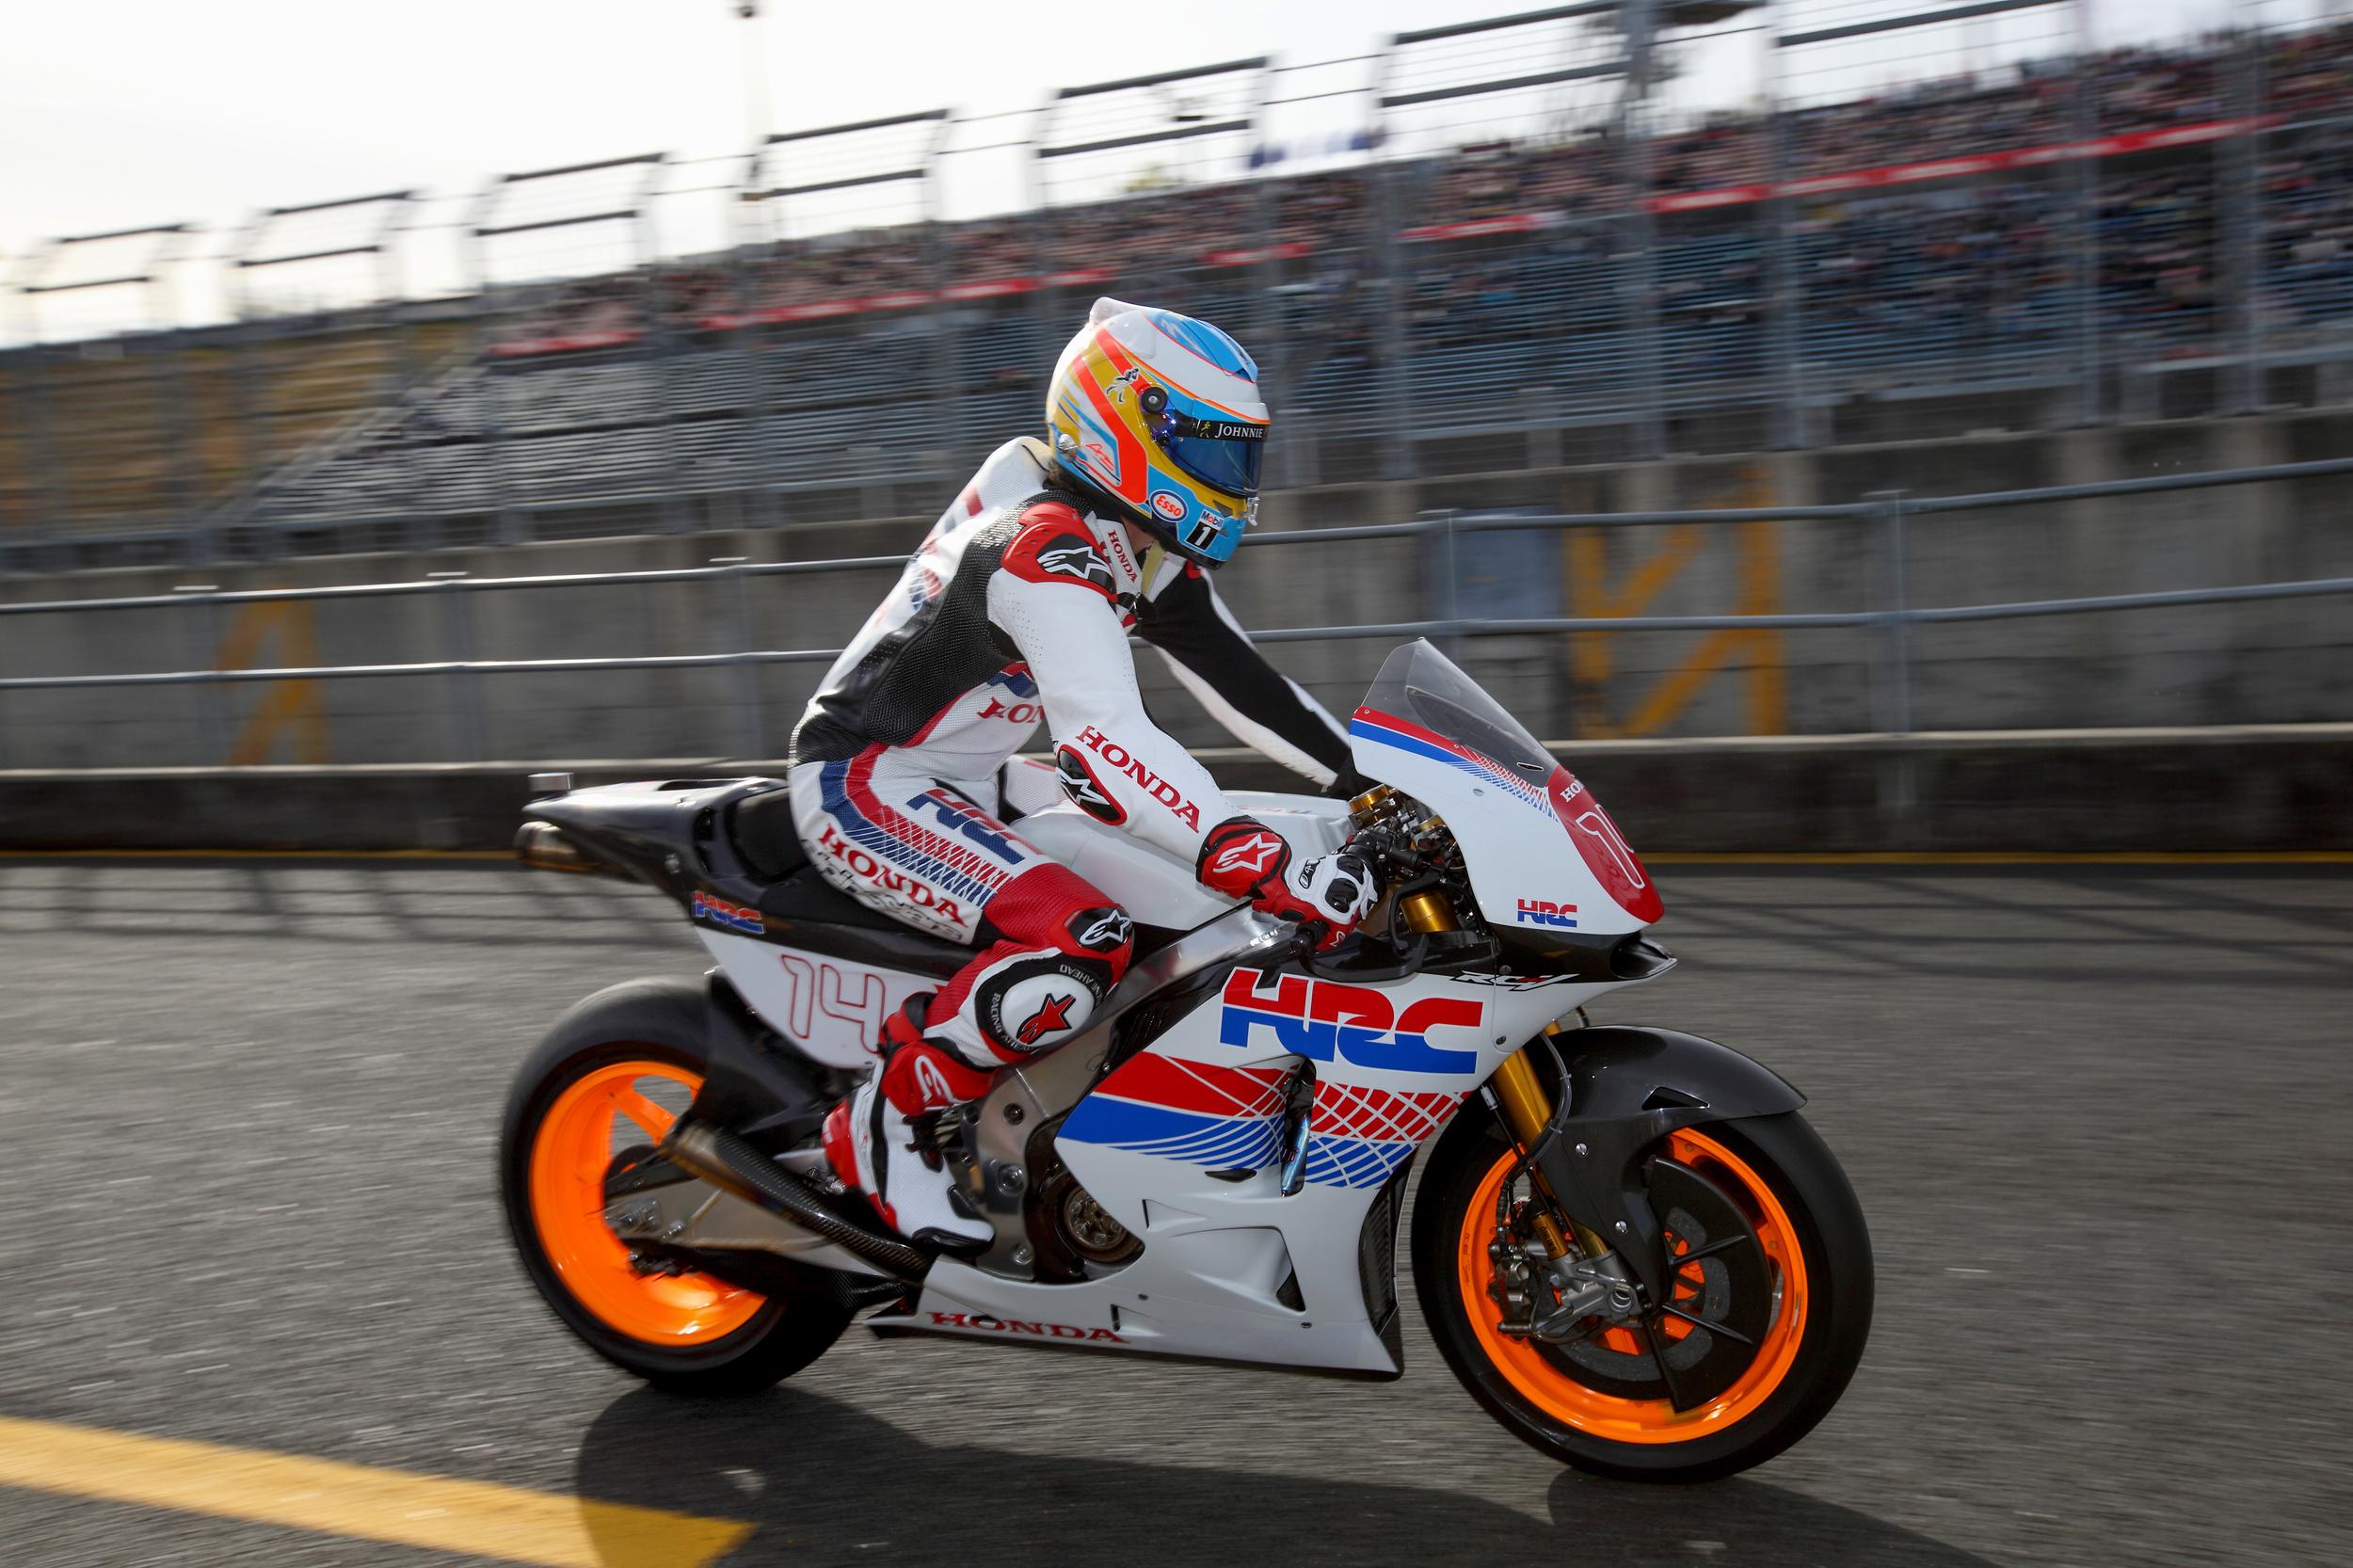 Fernando Alonso Rode Honda RC213V 1